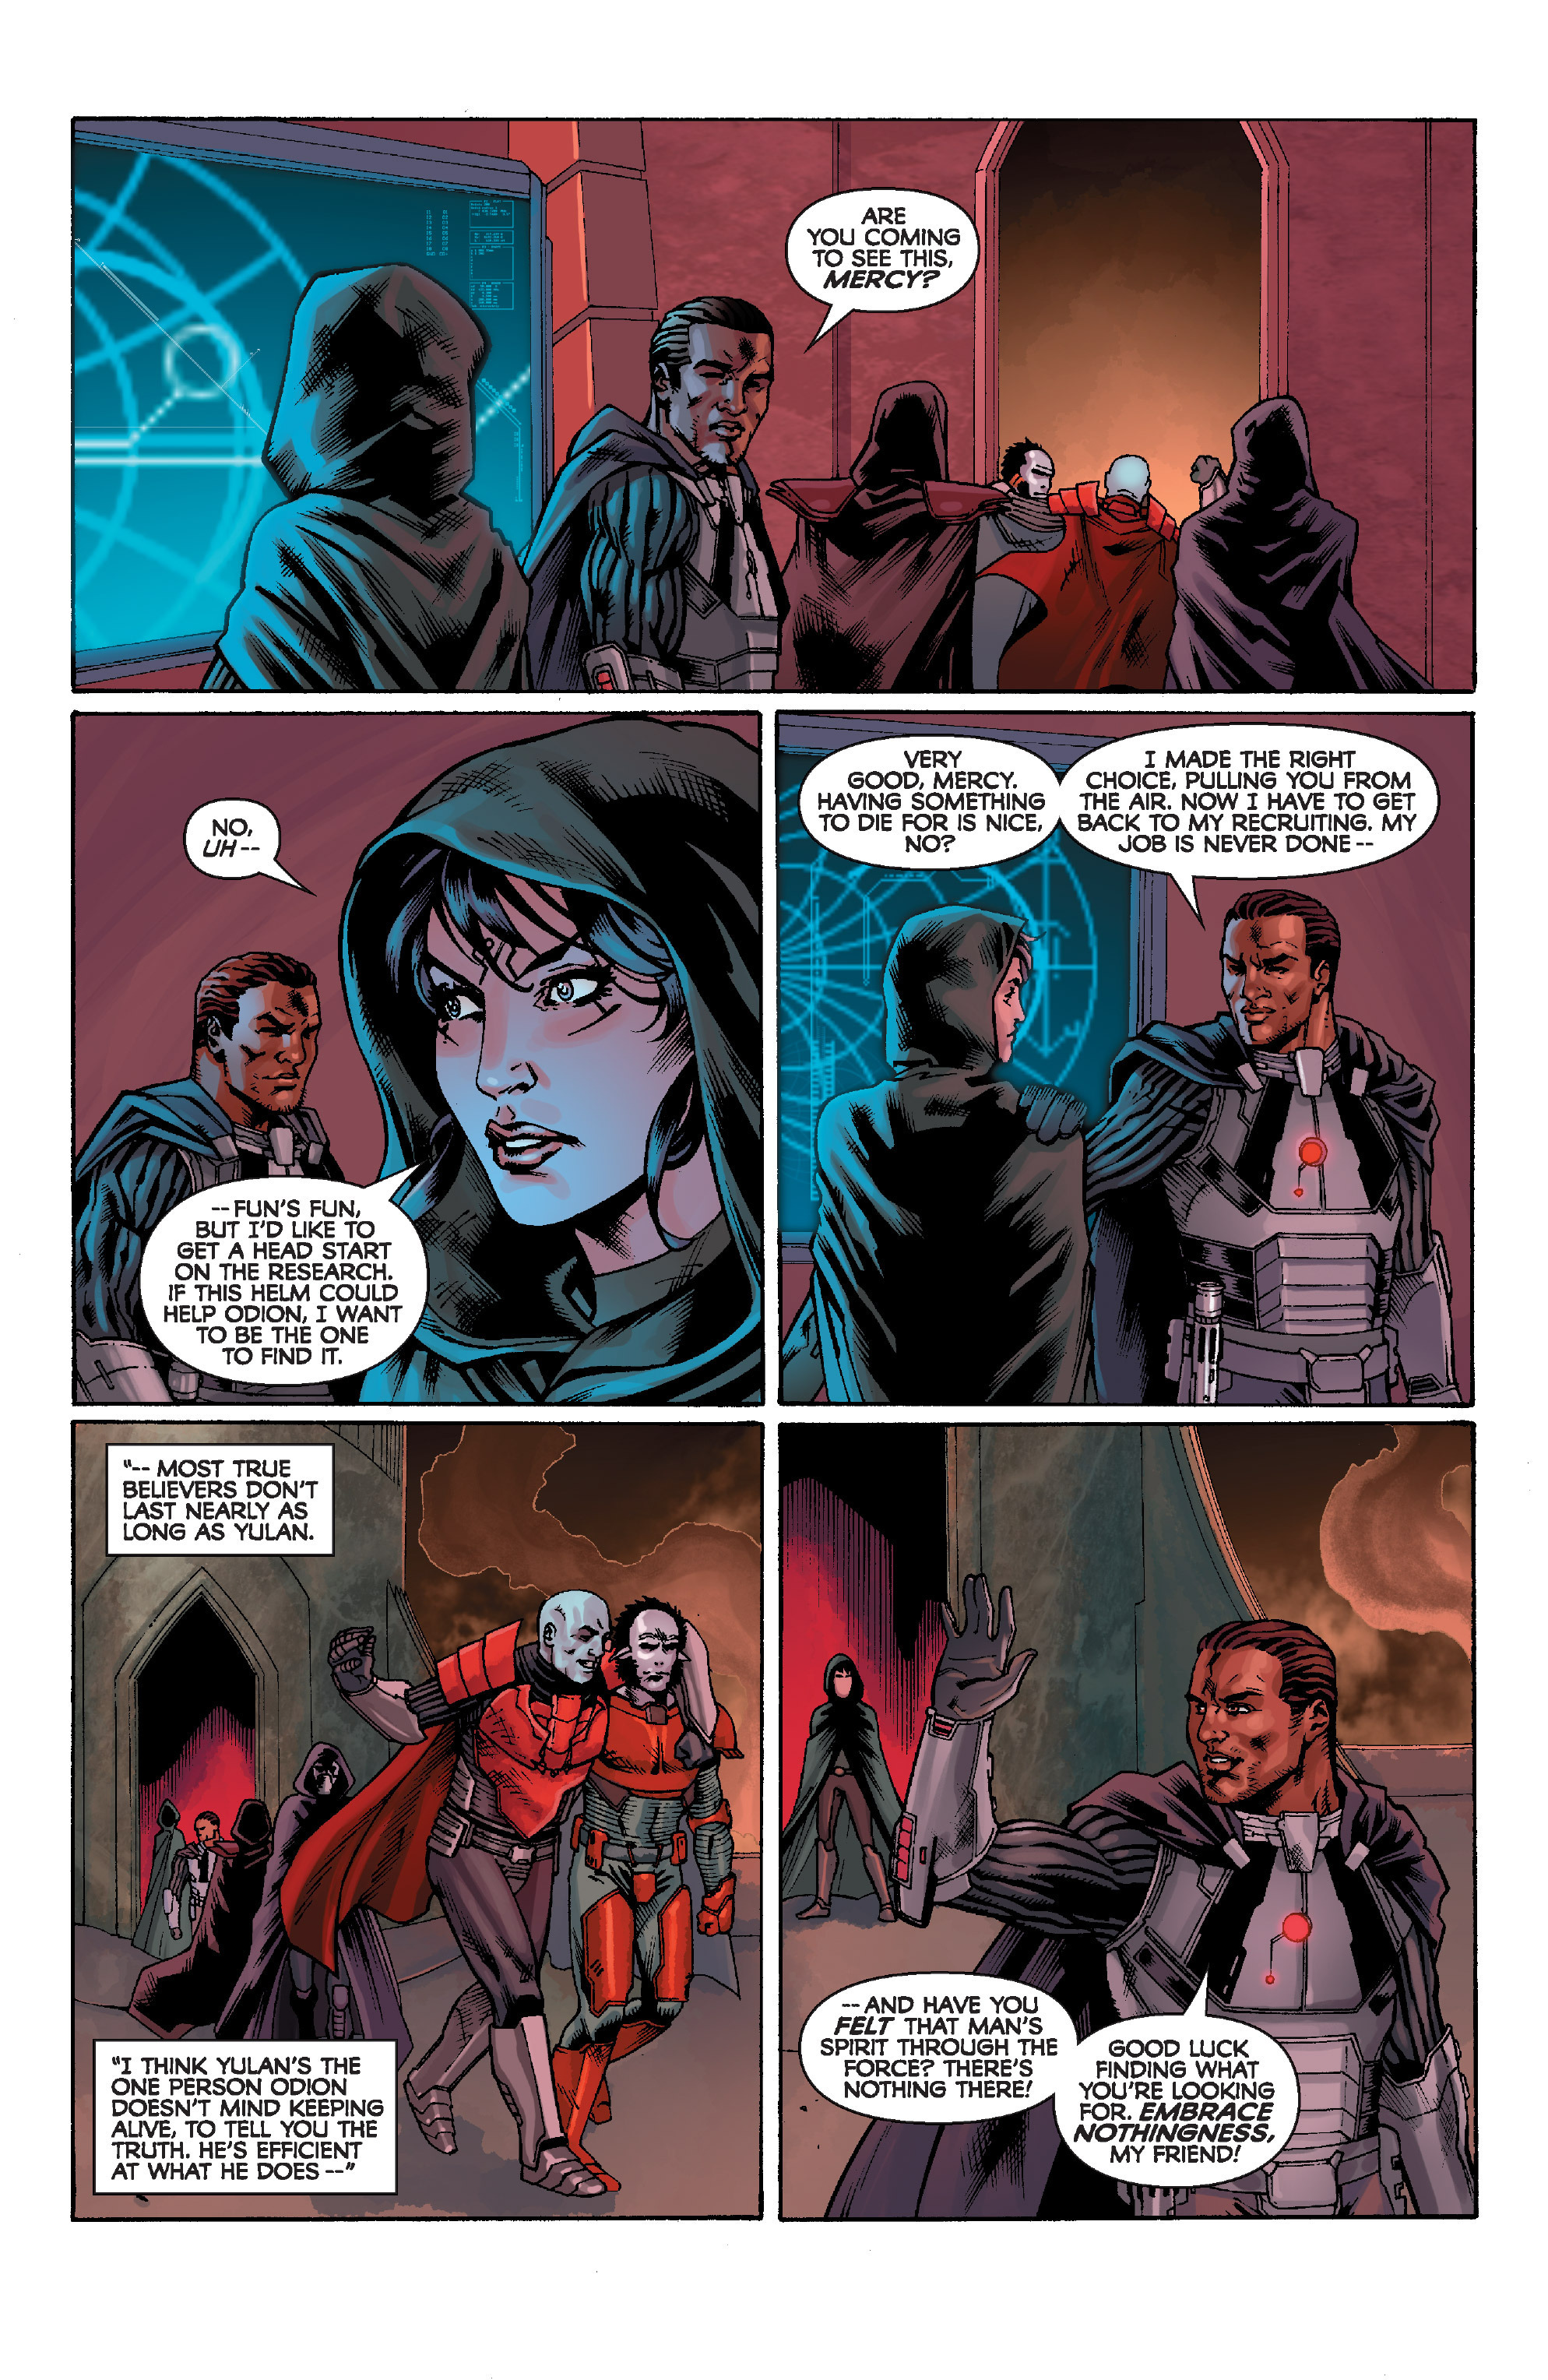 Read online Star Wars: Knight Errant - Escape comic -  Issue #1 - 22